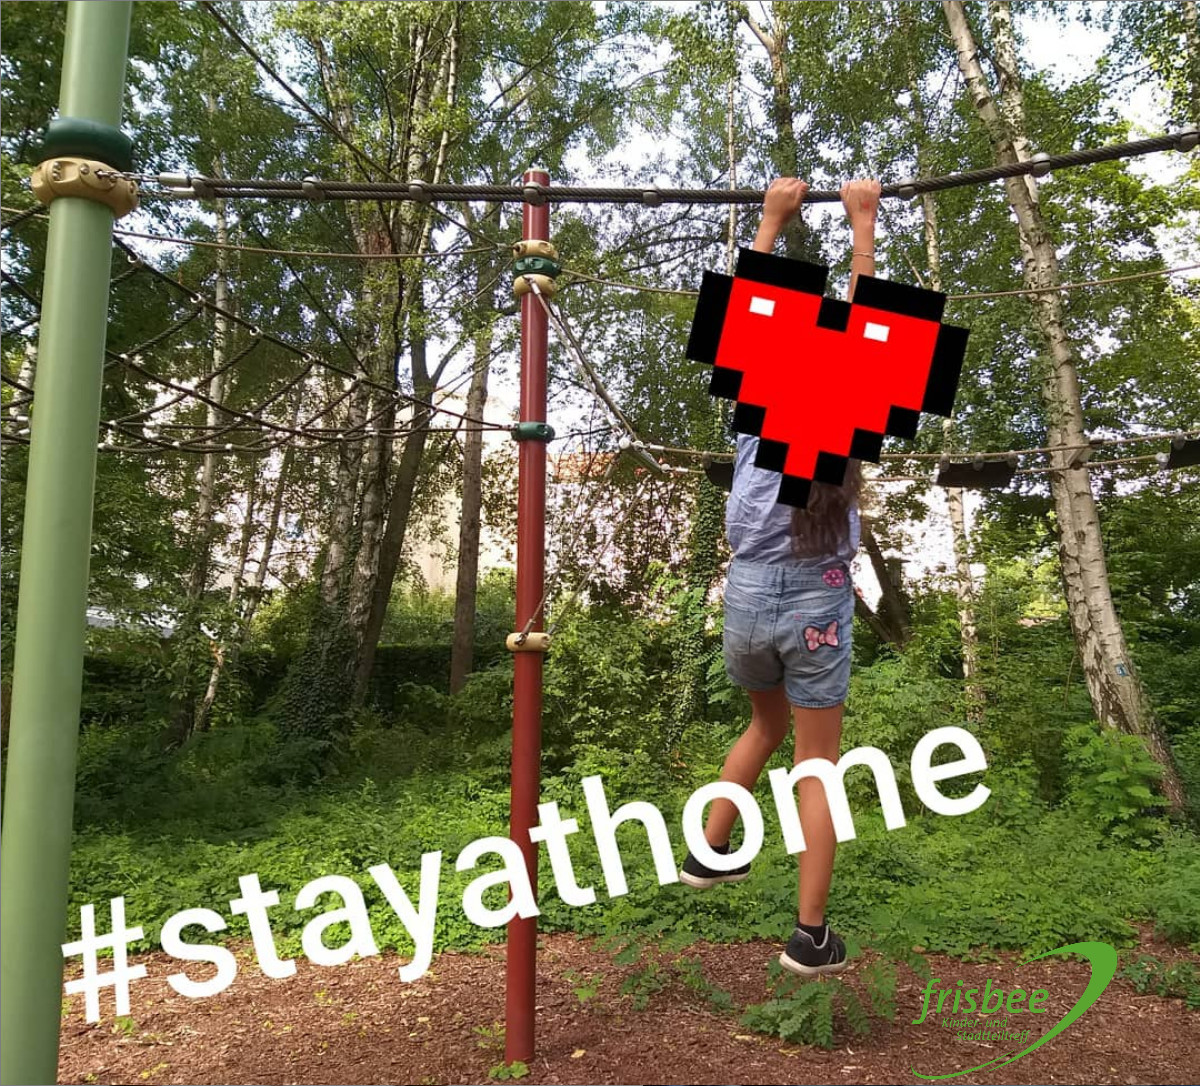 stayhome frisbee